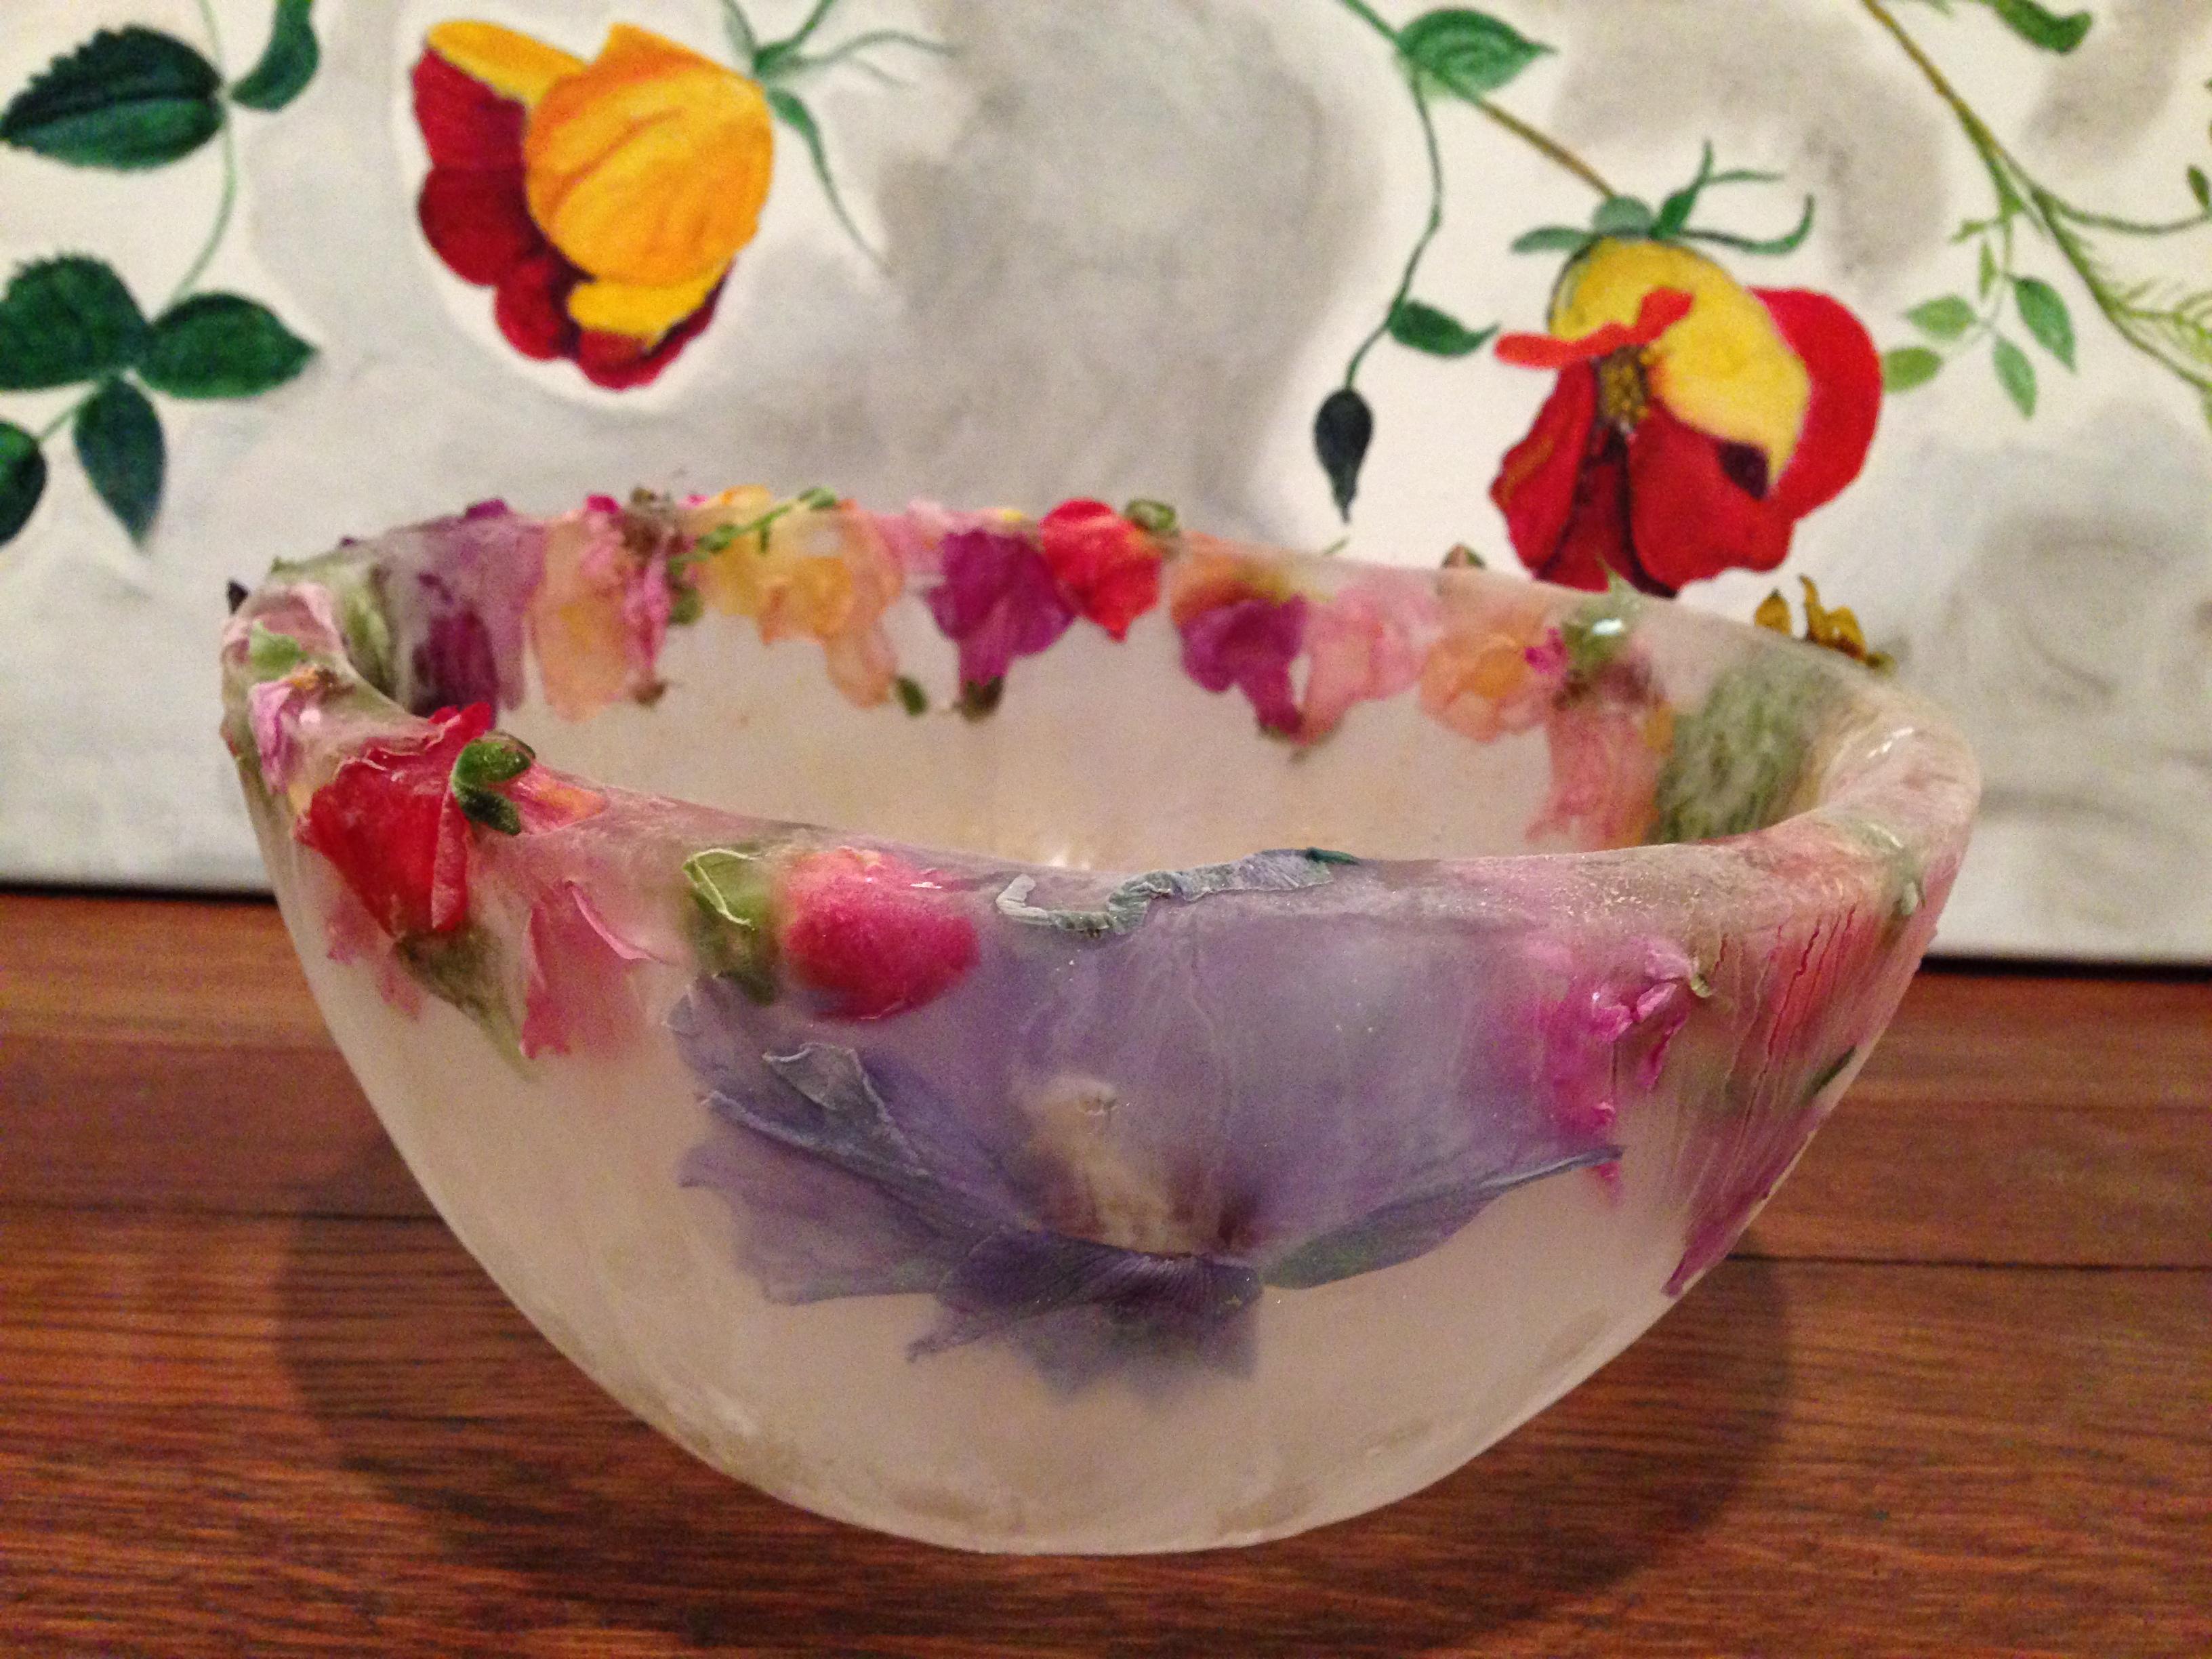 marlene simon | Simon Says Gardening